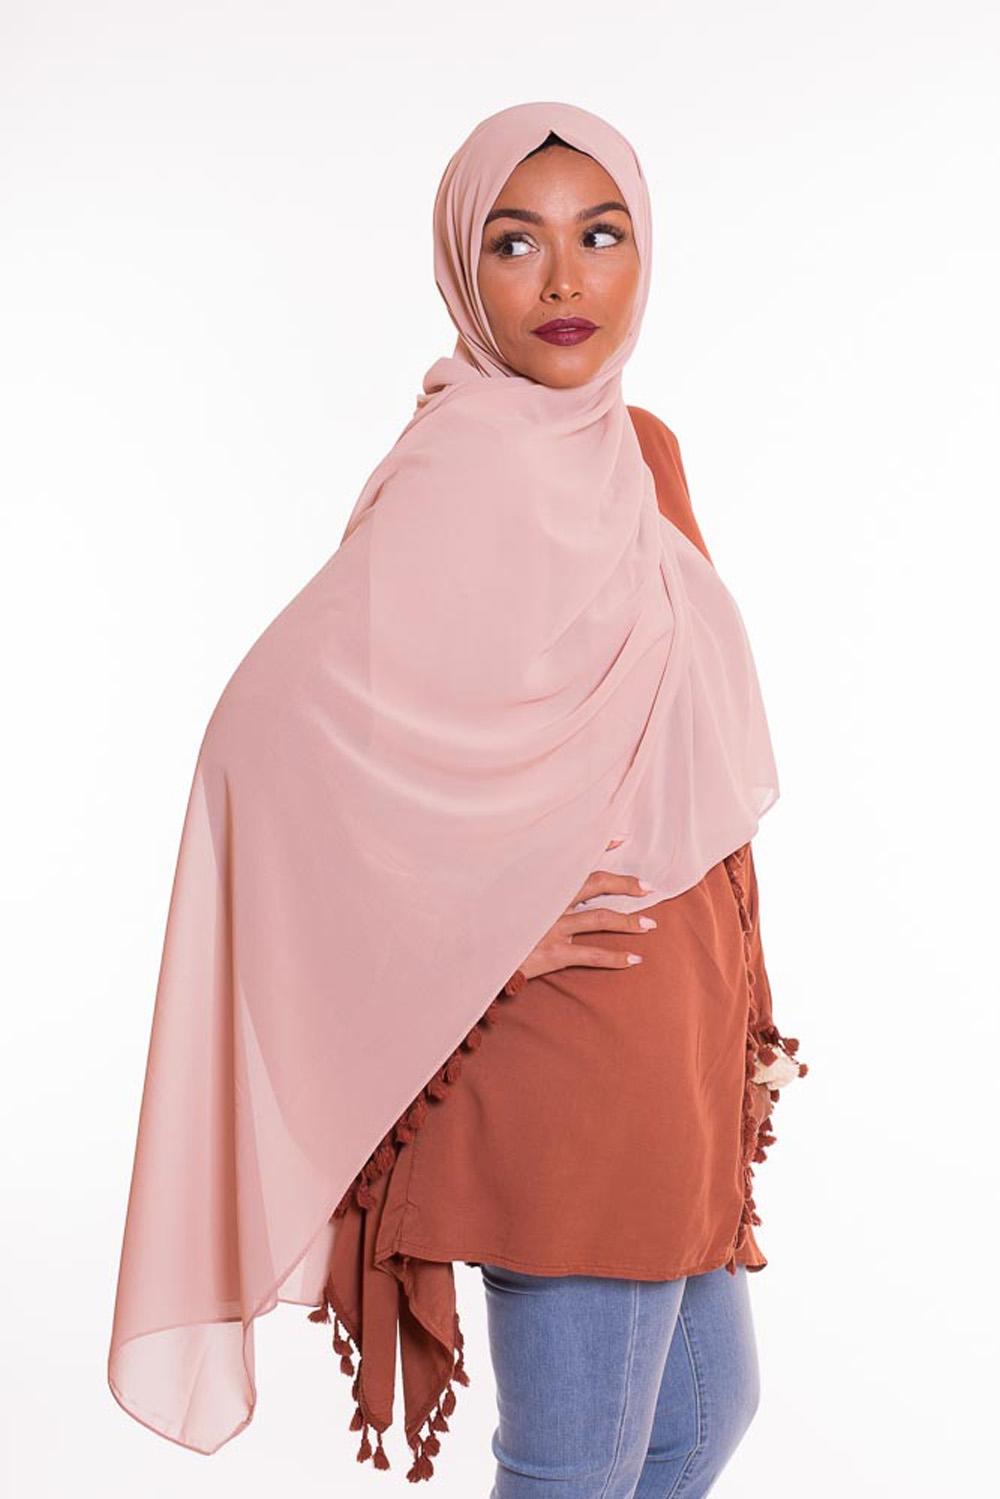 hijab xxl mousseline beige rosé